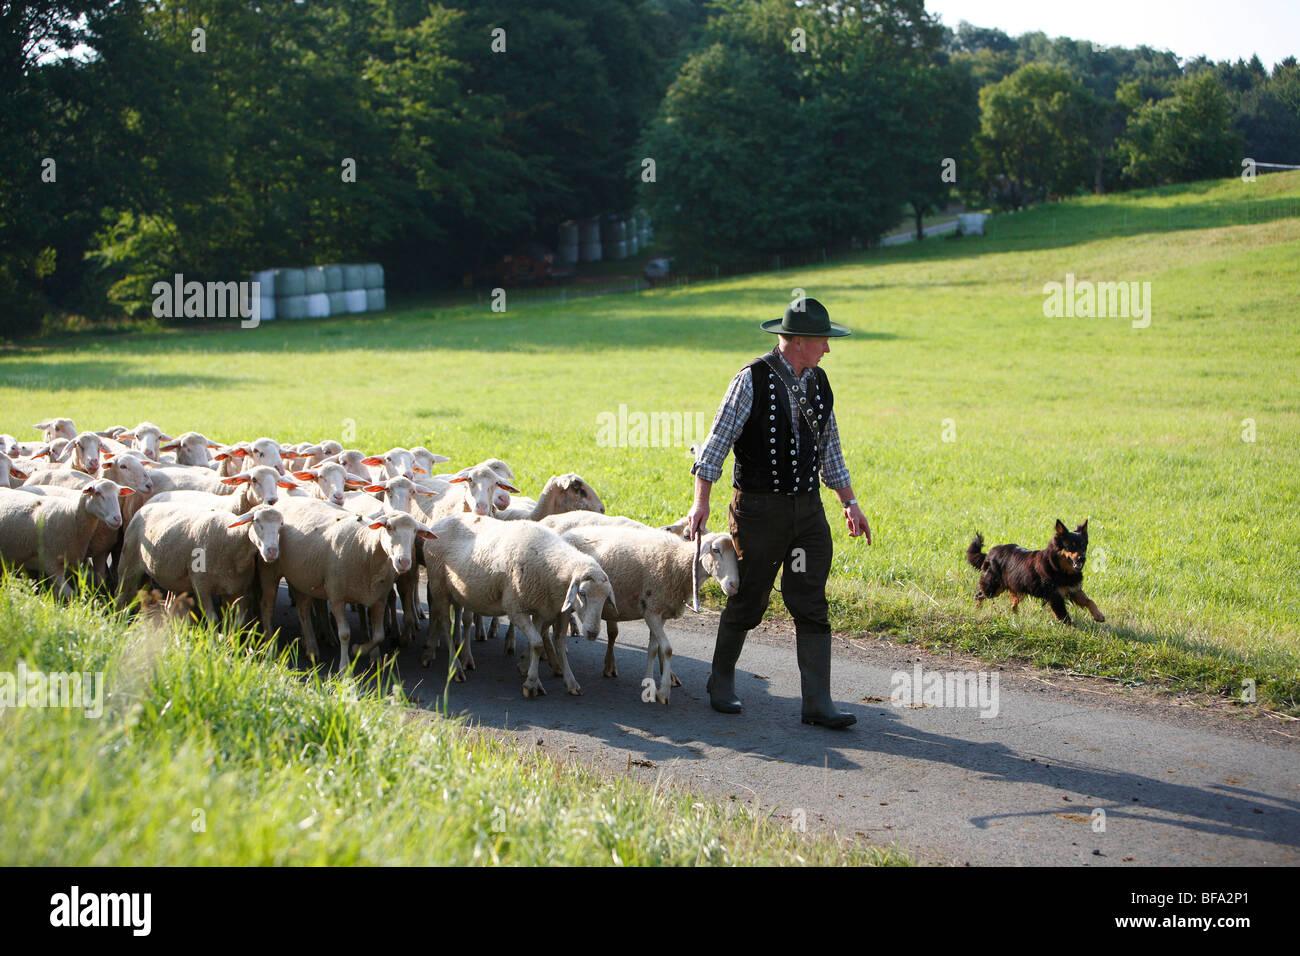 Gelbbacke (Canis lupus f. familiaris), shepherd leading his flock of sheep over a narrow asphalt road through meadows - Stock Image